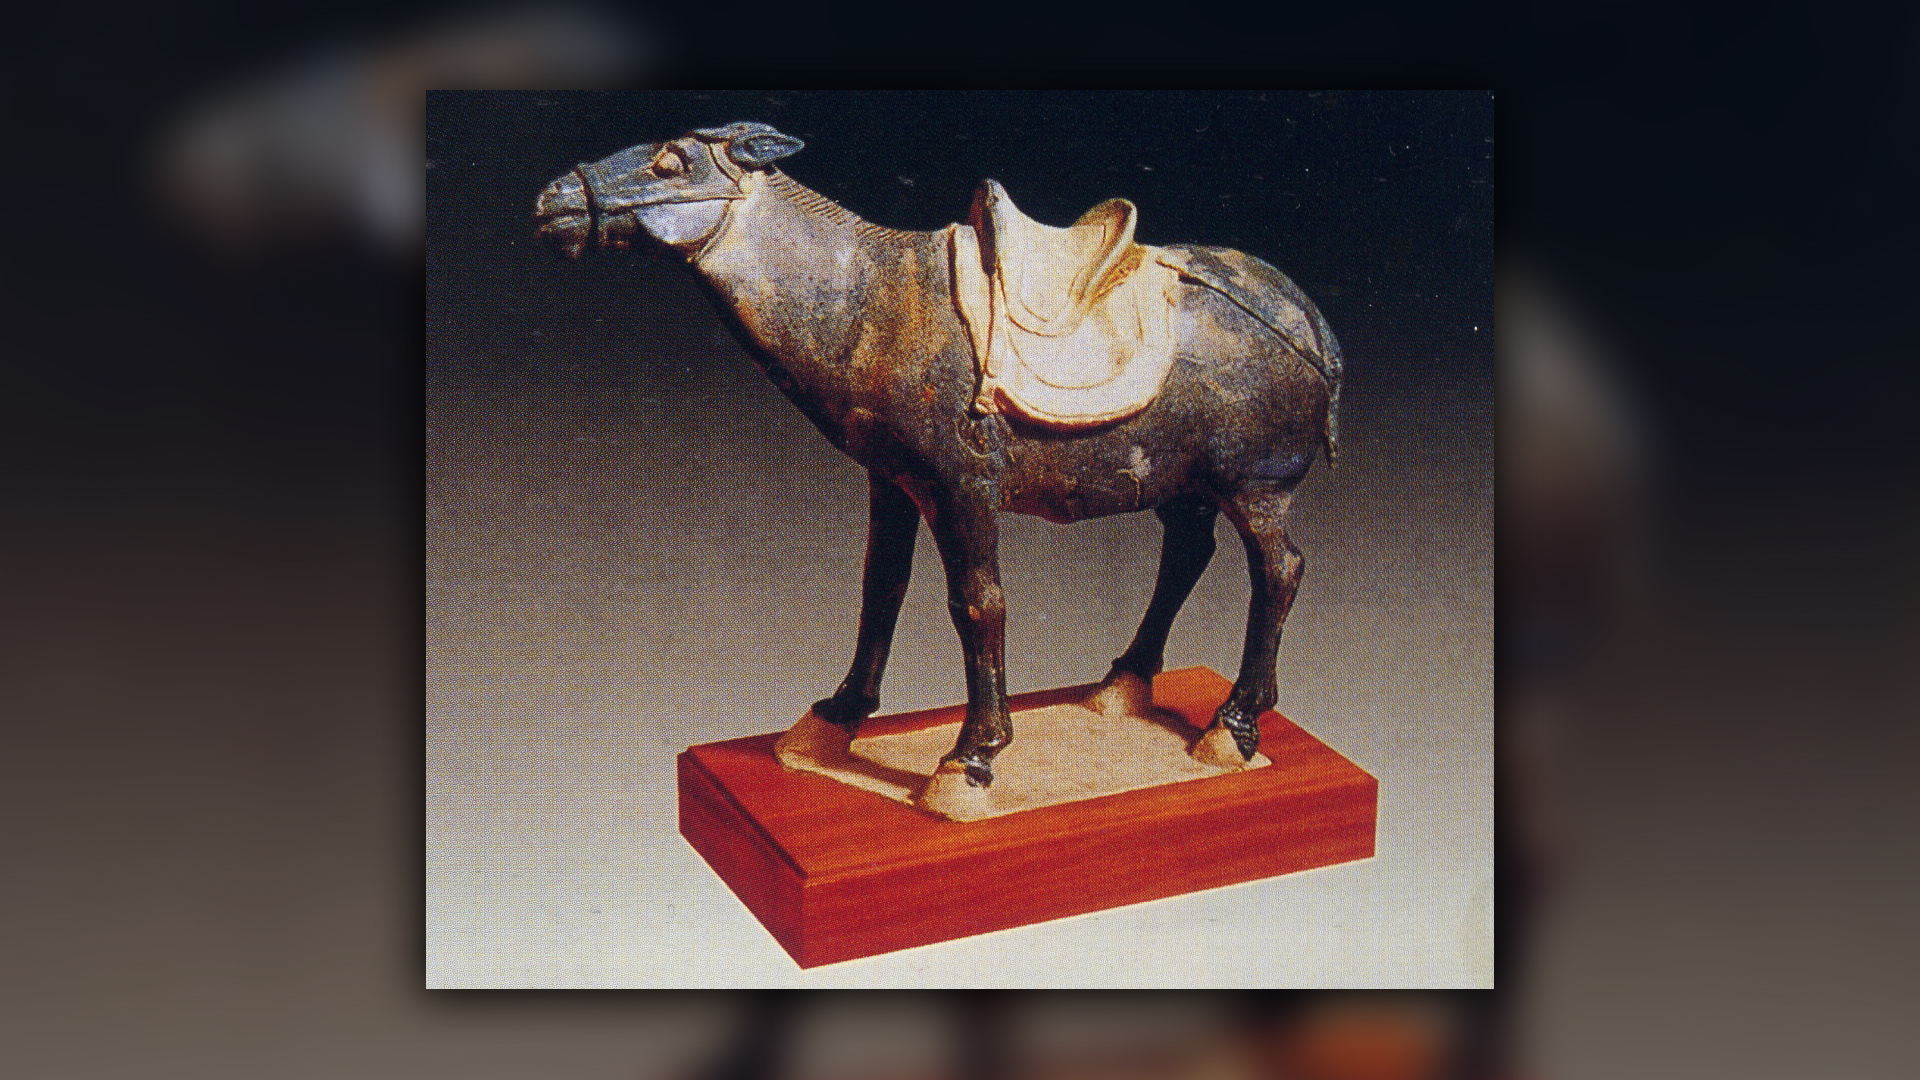 Une figurine d'âne émaillée tricolore de Xi'an.